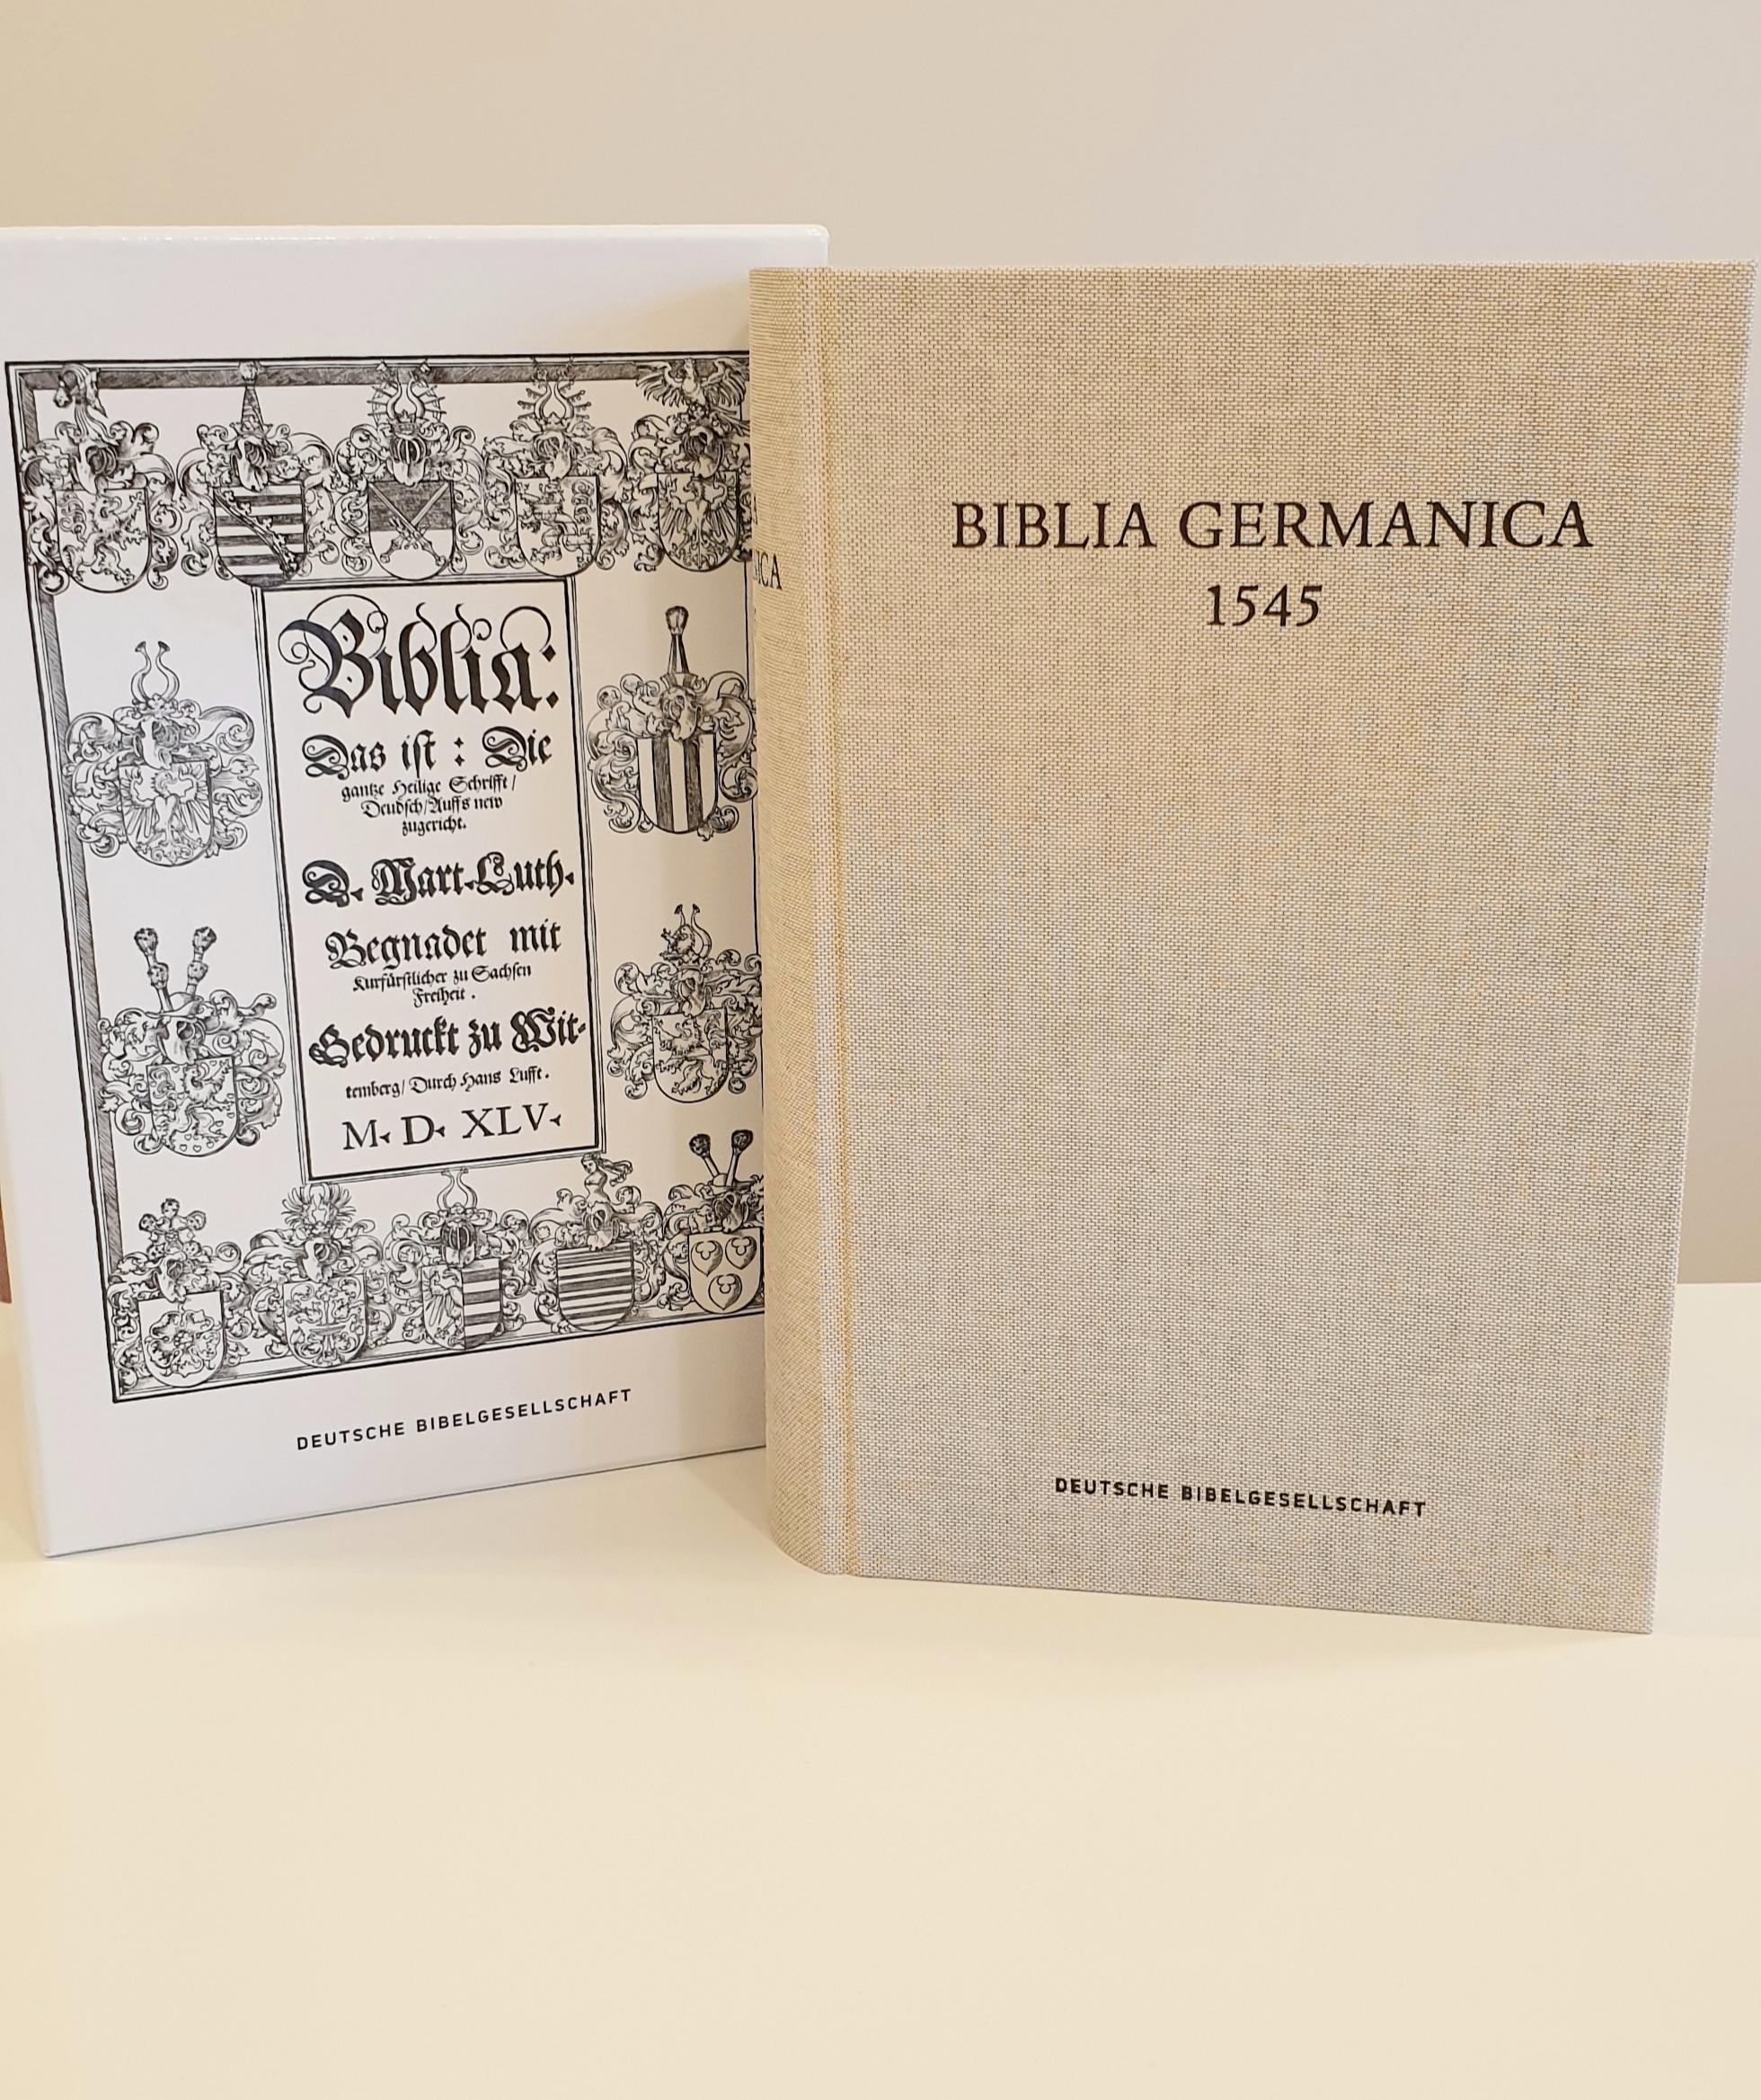 Biblia germanica artikelnummer 2490 via bibelbutiken.se